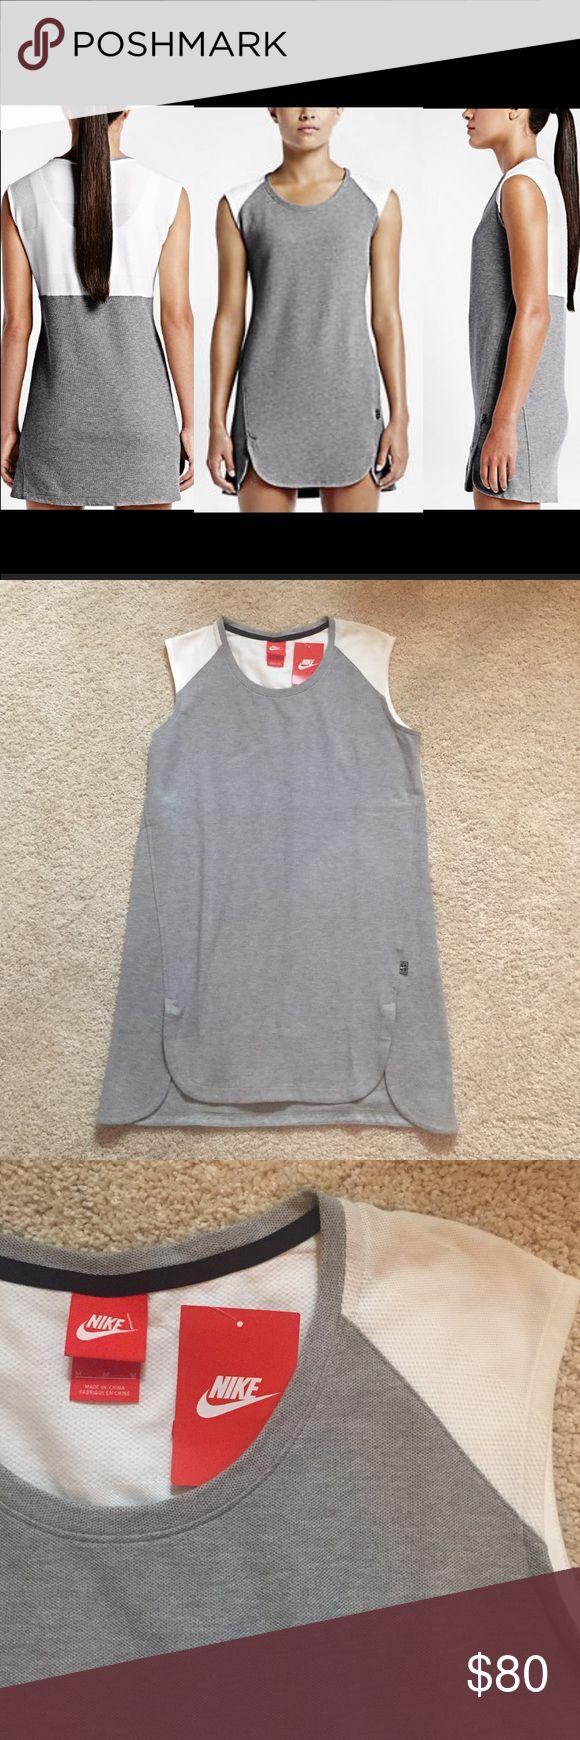 Nike Dress Sleeveless Nike dress, white and grey. 100% cotton. Brand new with tags. Nike Dresses